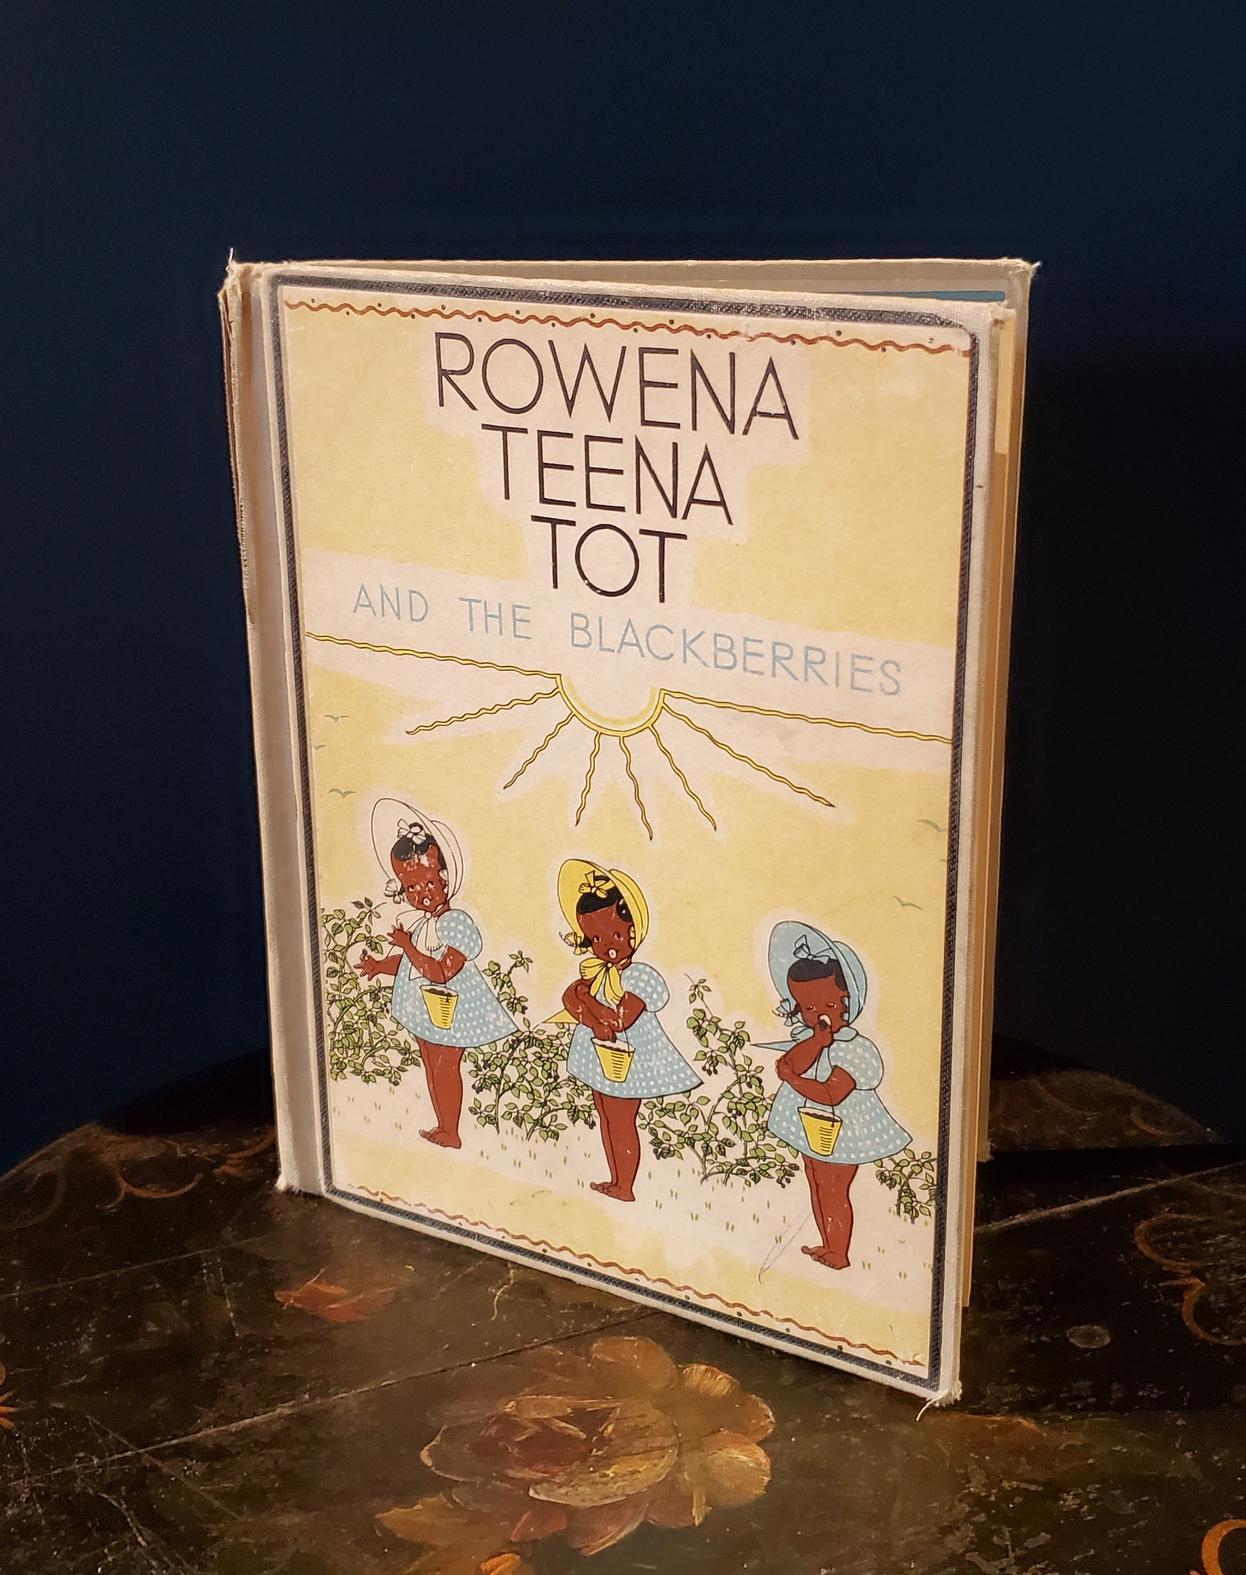 Childrens Book - Rowena Teena Tot and the Blackberries